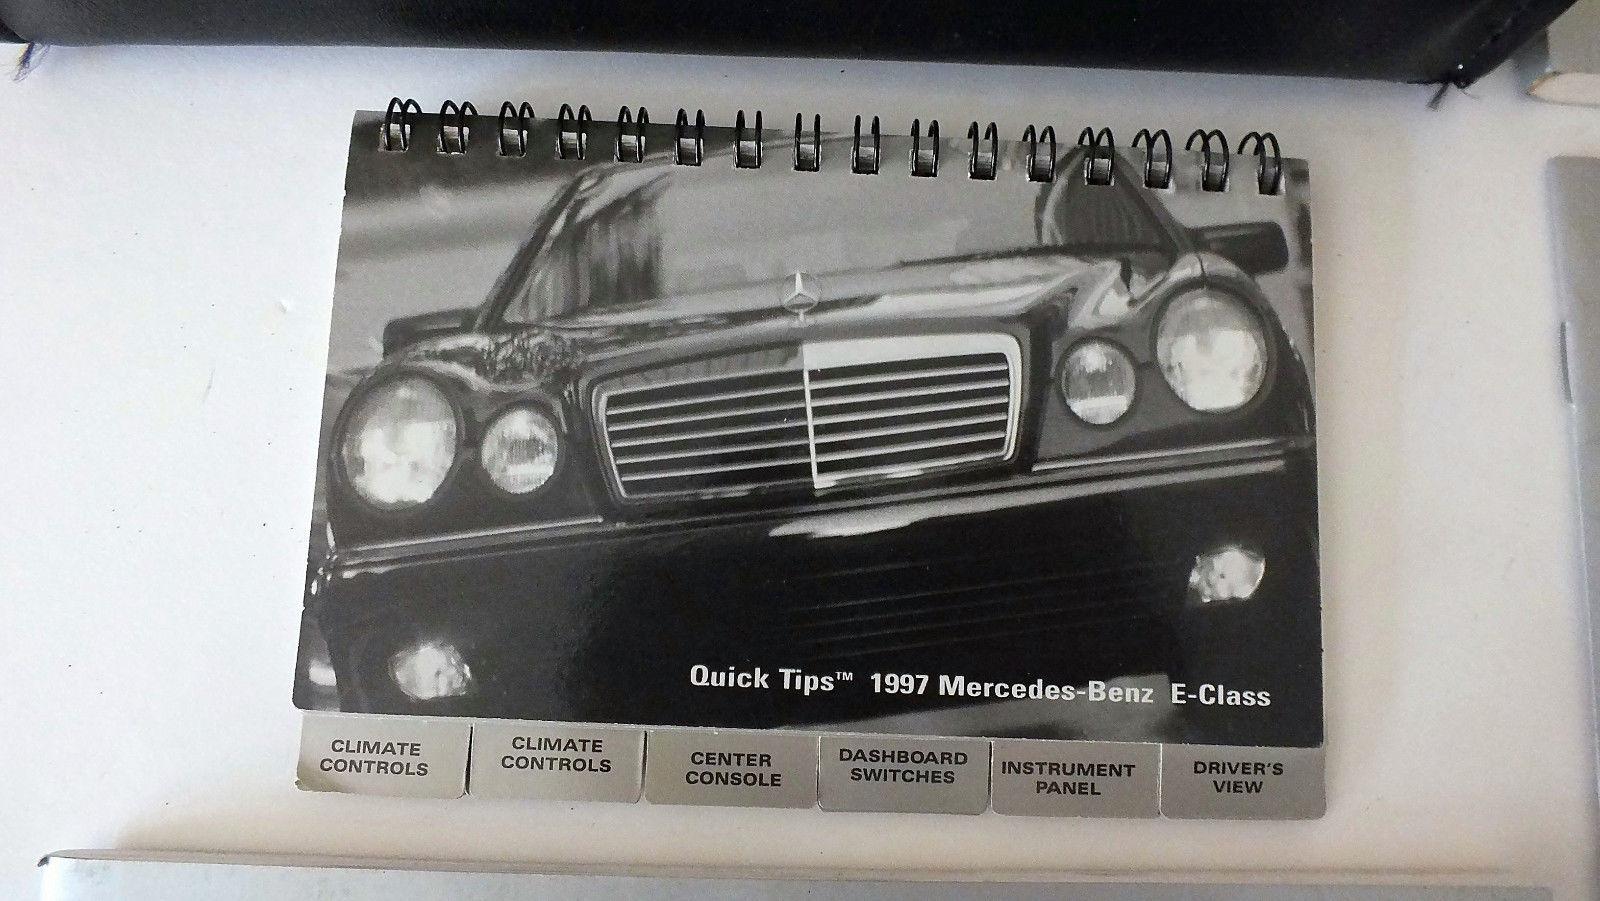 1997 mercedes benz e300 diesel e320 e420 and similar items rh bonanza com 1997 Mercedes-Benz C220 1997 mercedes benz e420 owners manual pdf